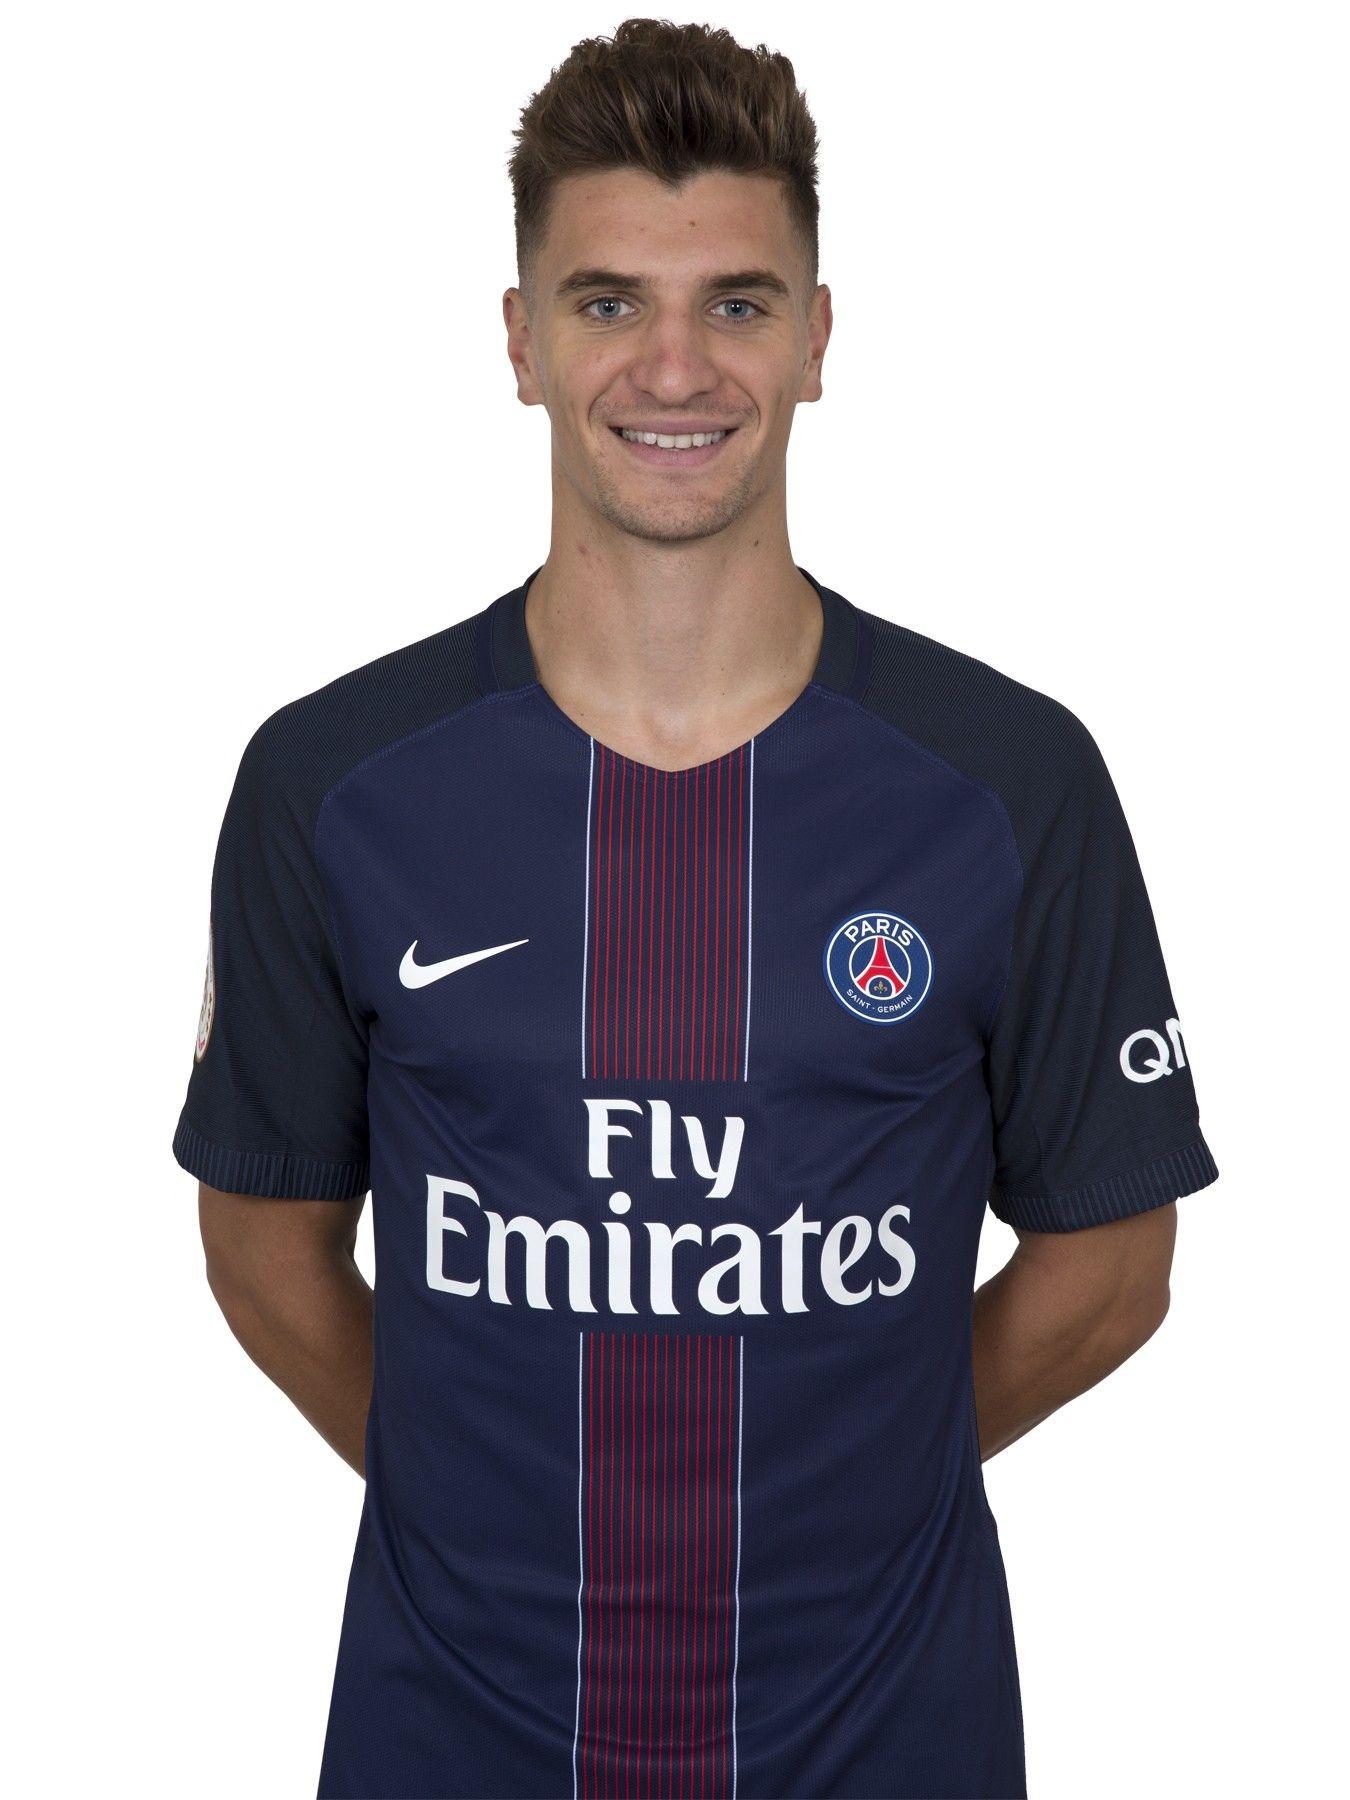 Camiseta Paris Saint Germain Thomas MEUNIER